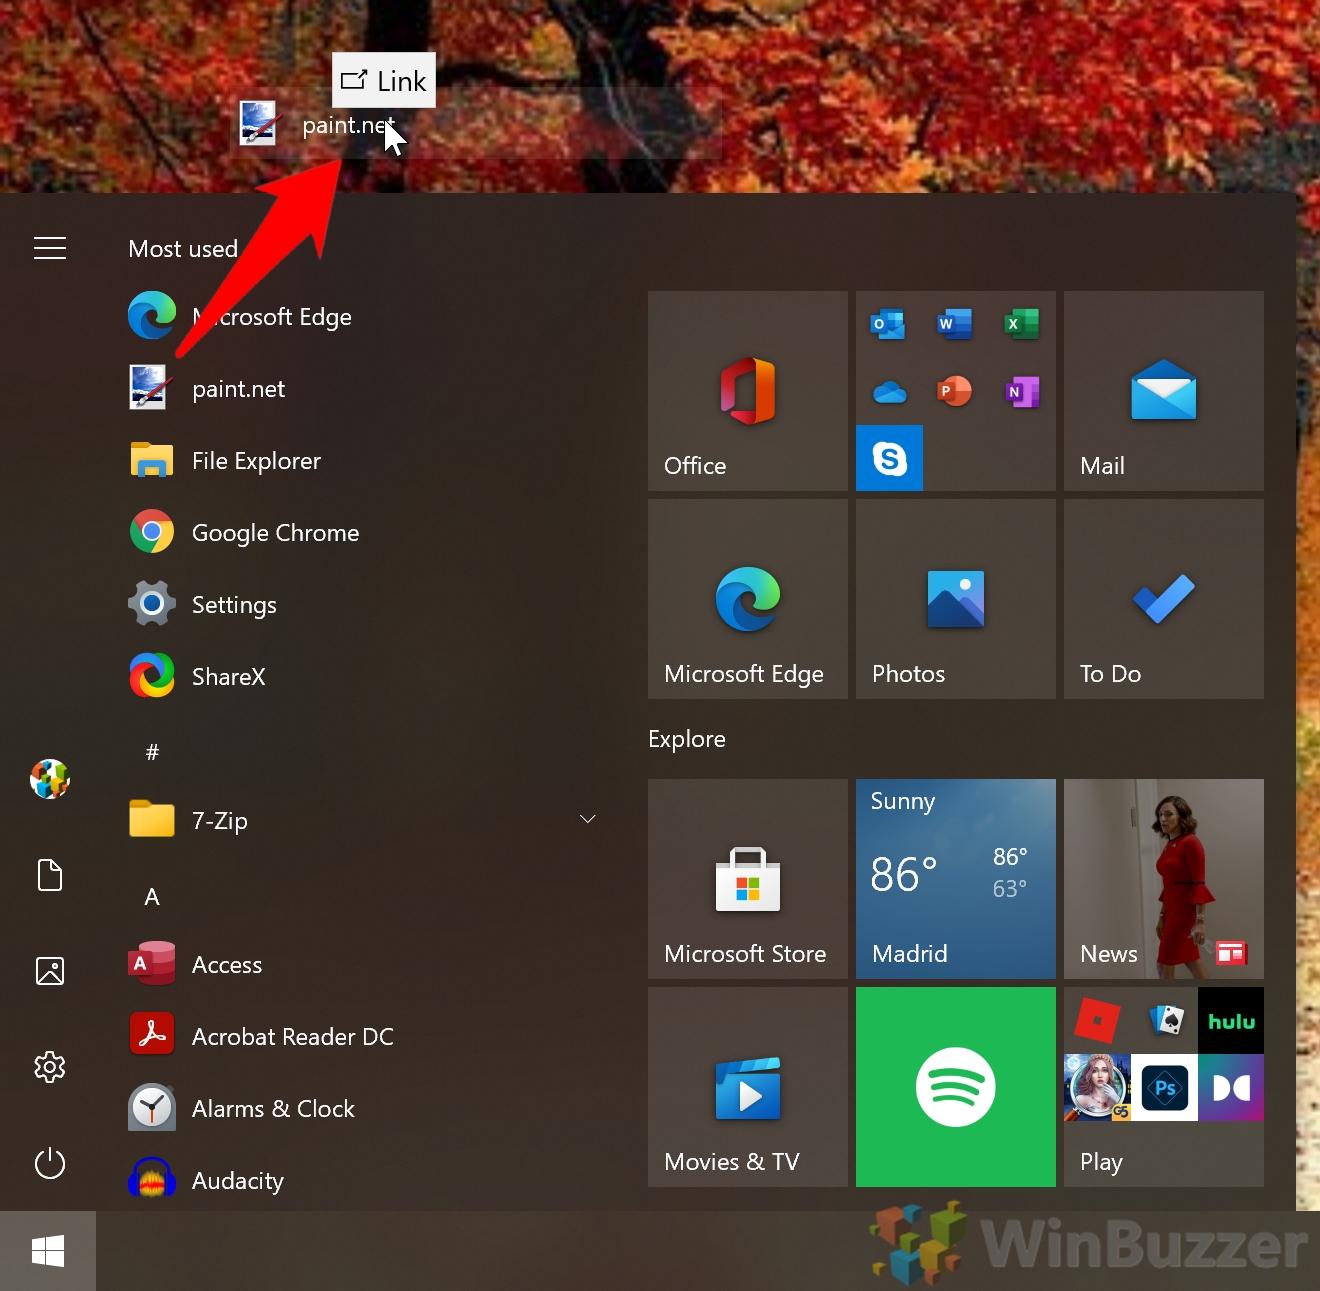 Windows 10 - Start Menu - Drag an Drop the App to the Desktop